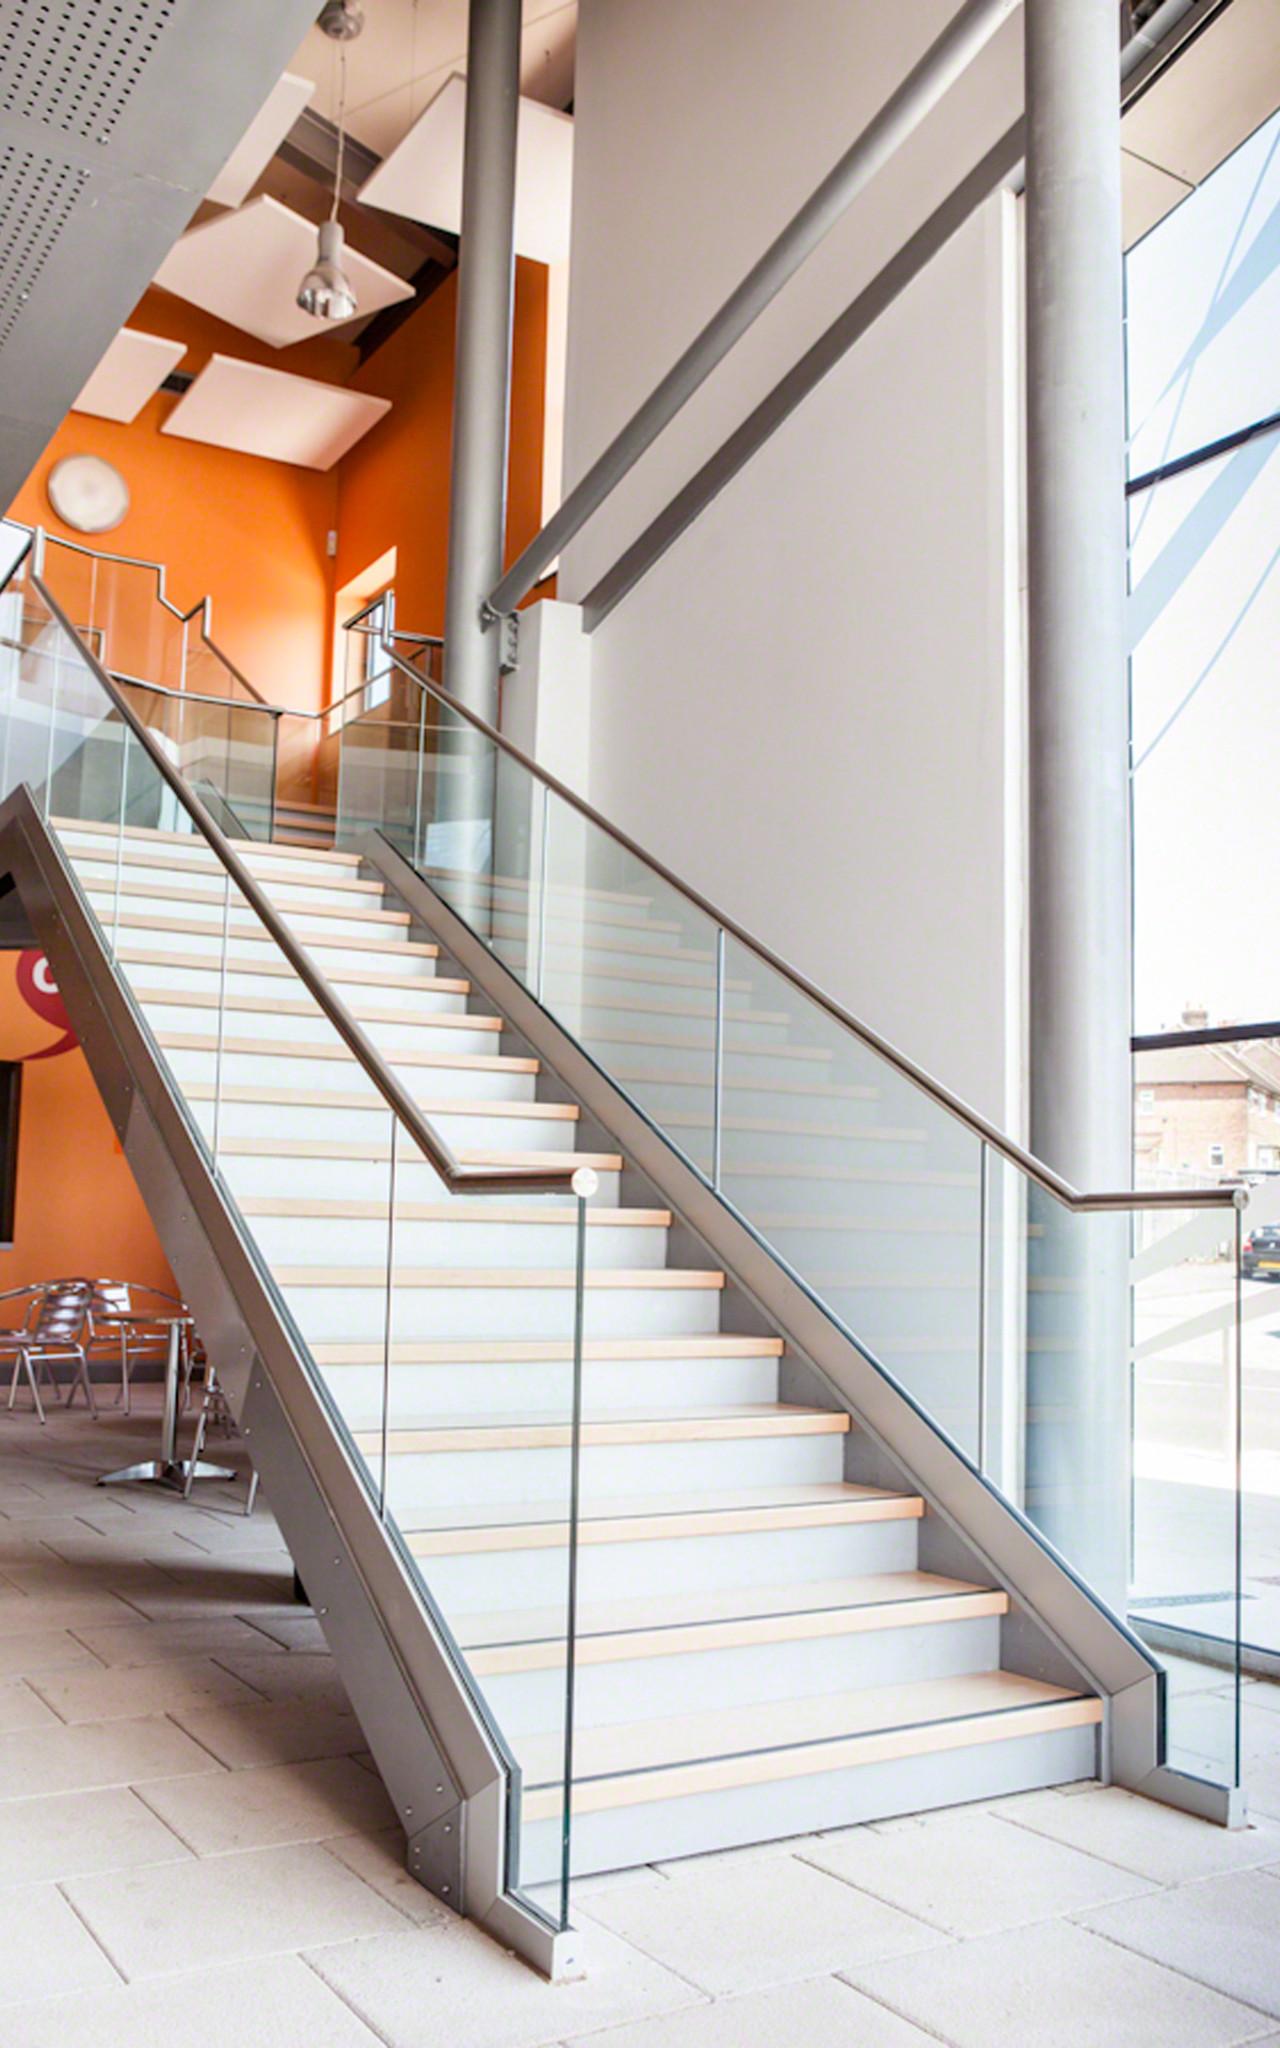 Barandilla easy glass slim superior sobre escalera - Normativa barandillas exteriores ...